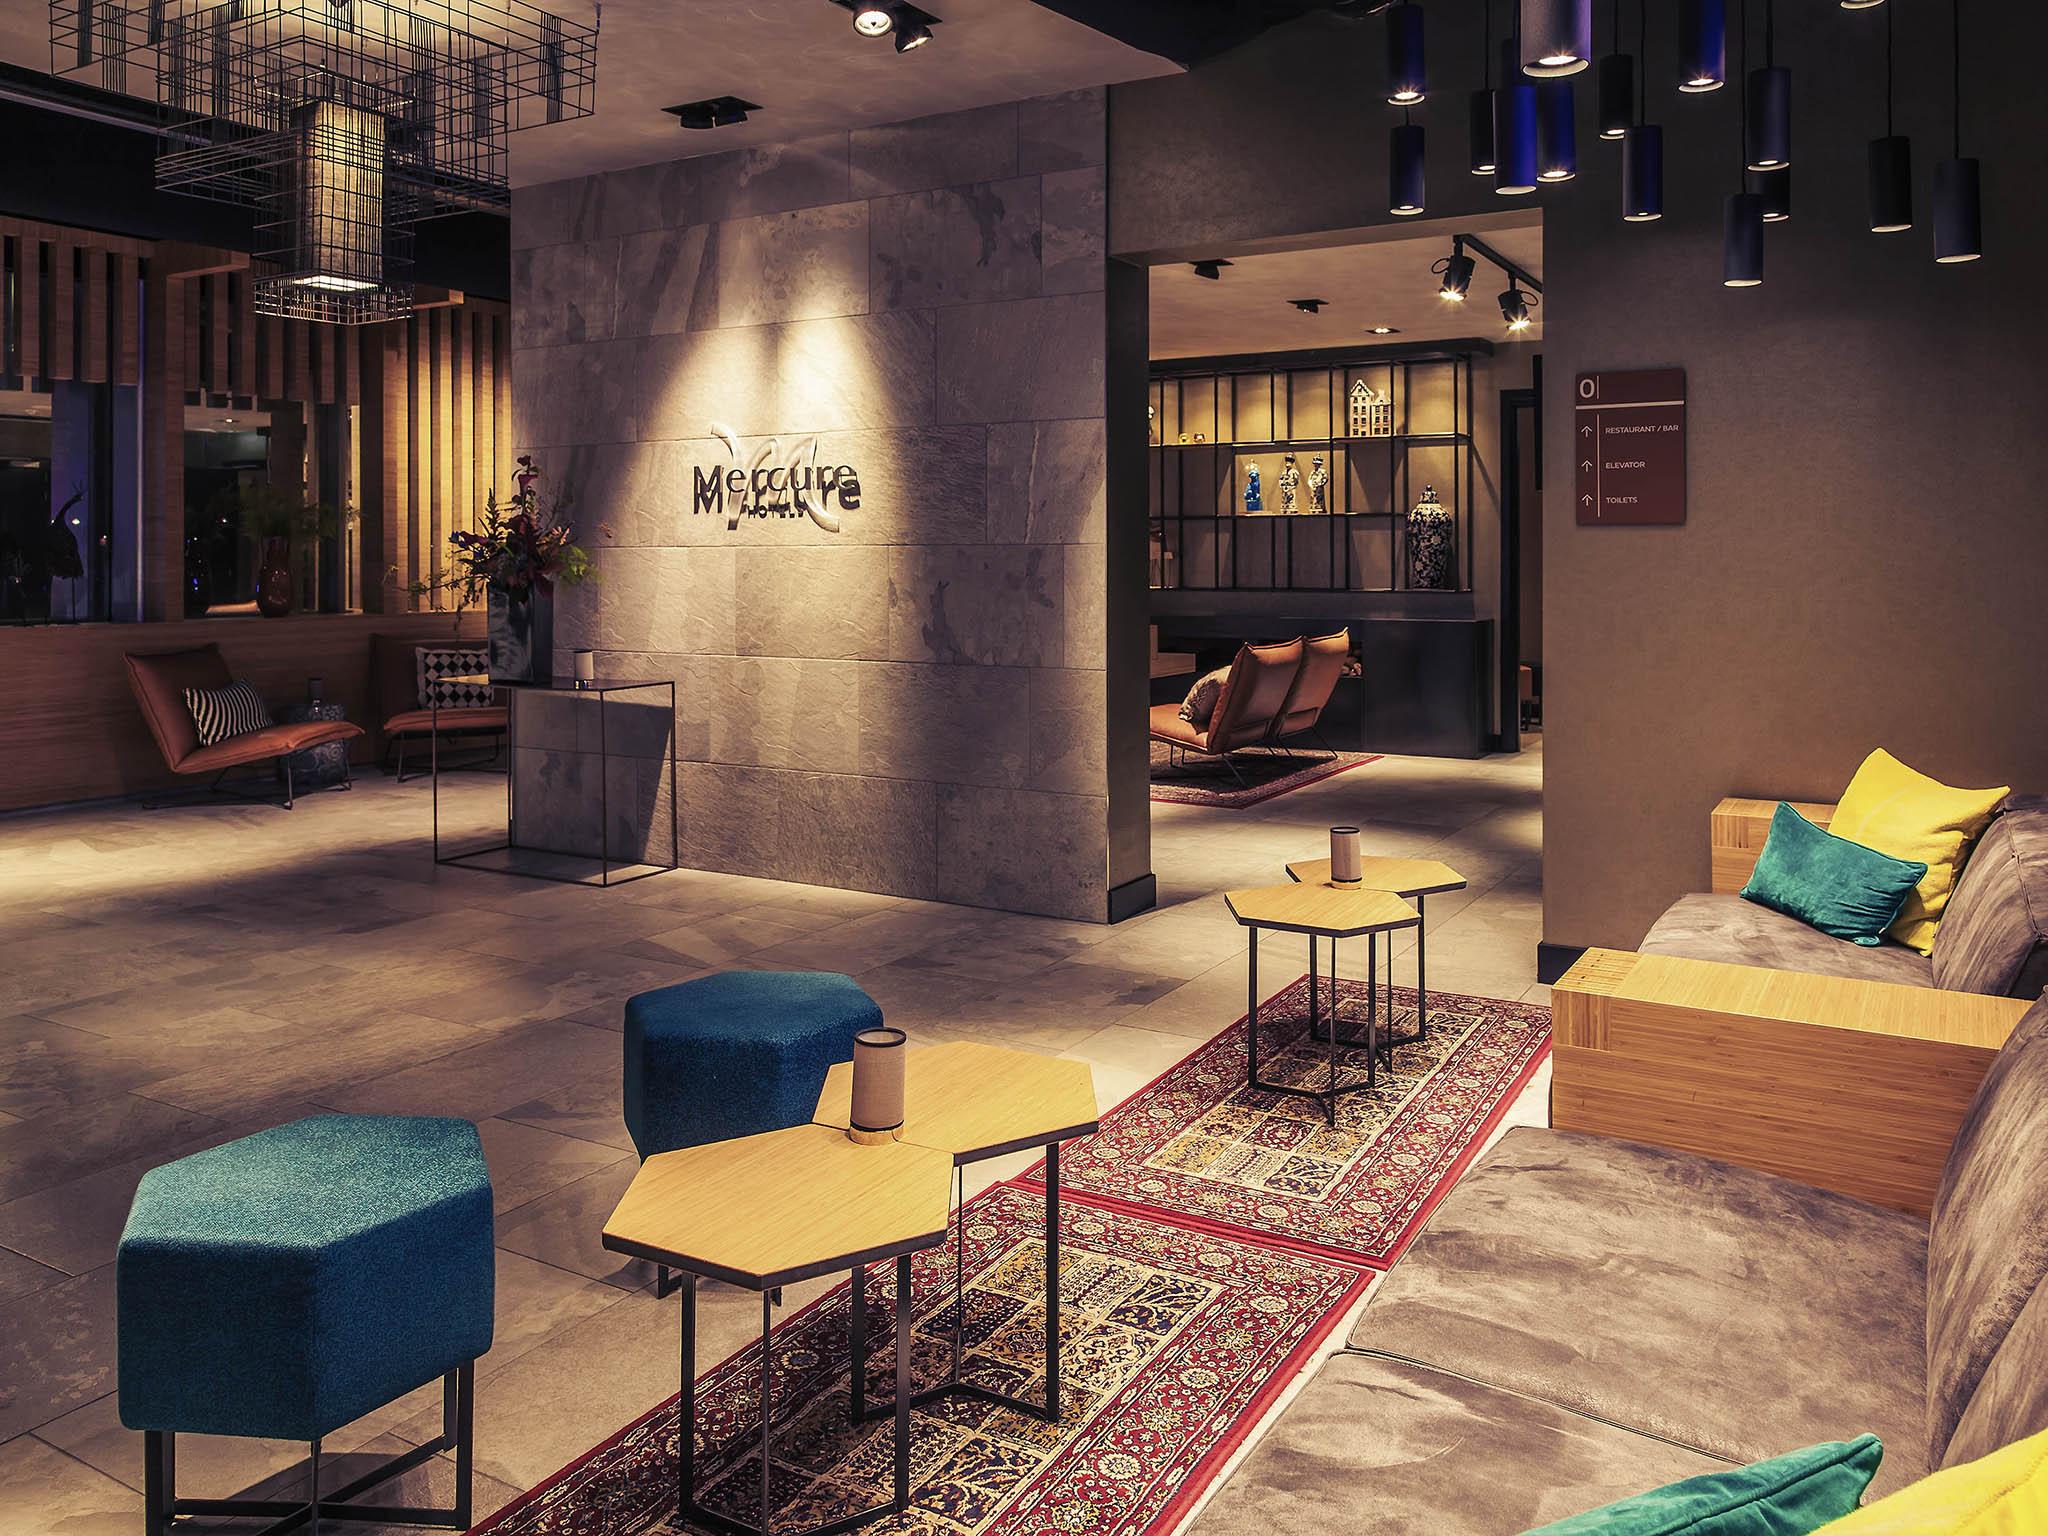 Hotel – Hotel Mercure Amsterdam Sloterdijk Station